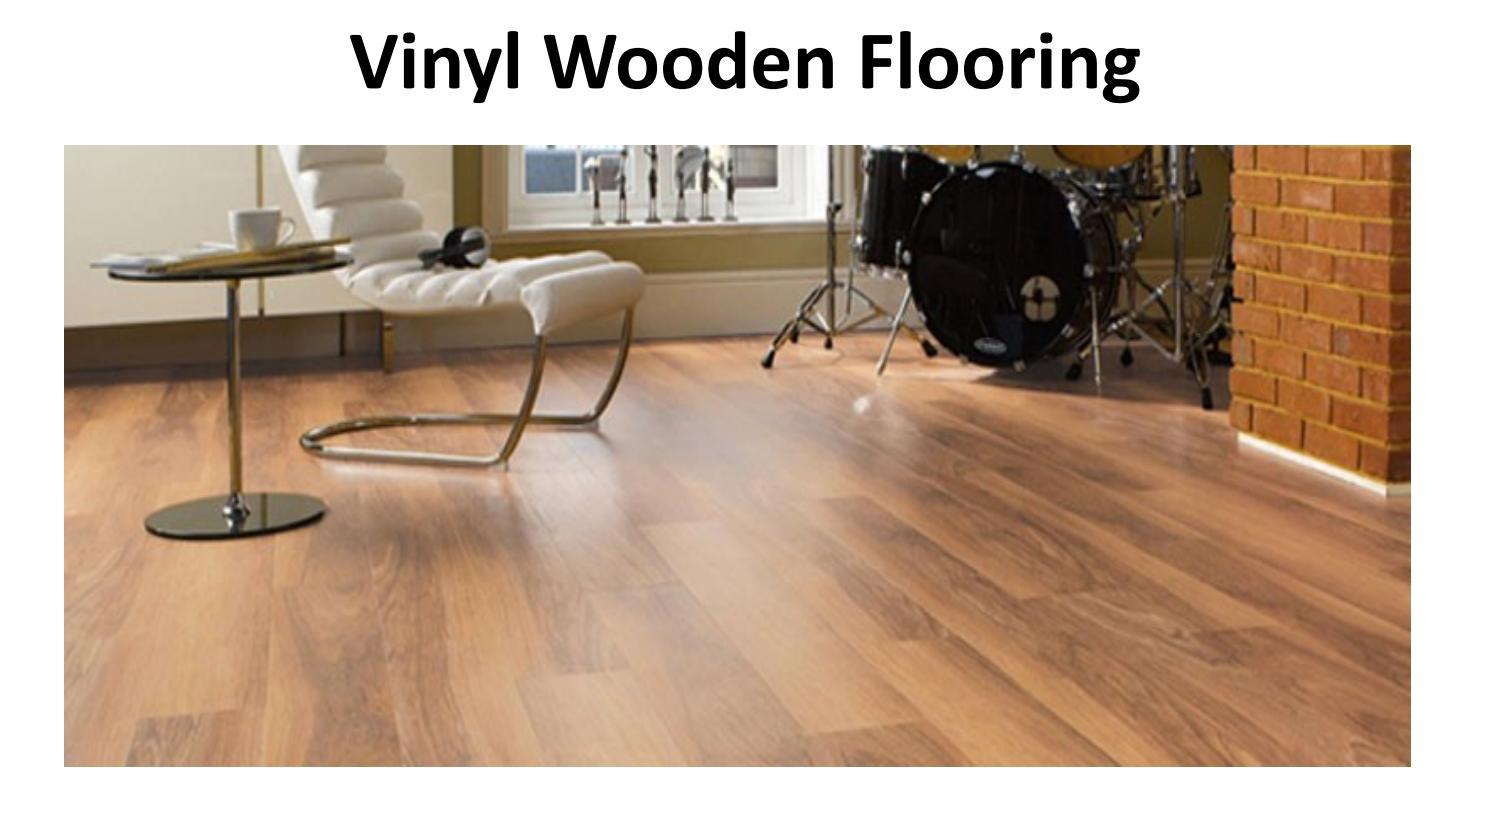 Vinyl Wooden Flooring Dubai By Davis Miller Issuu